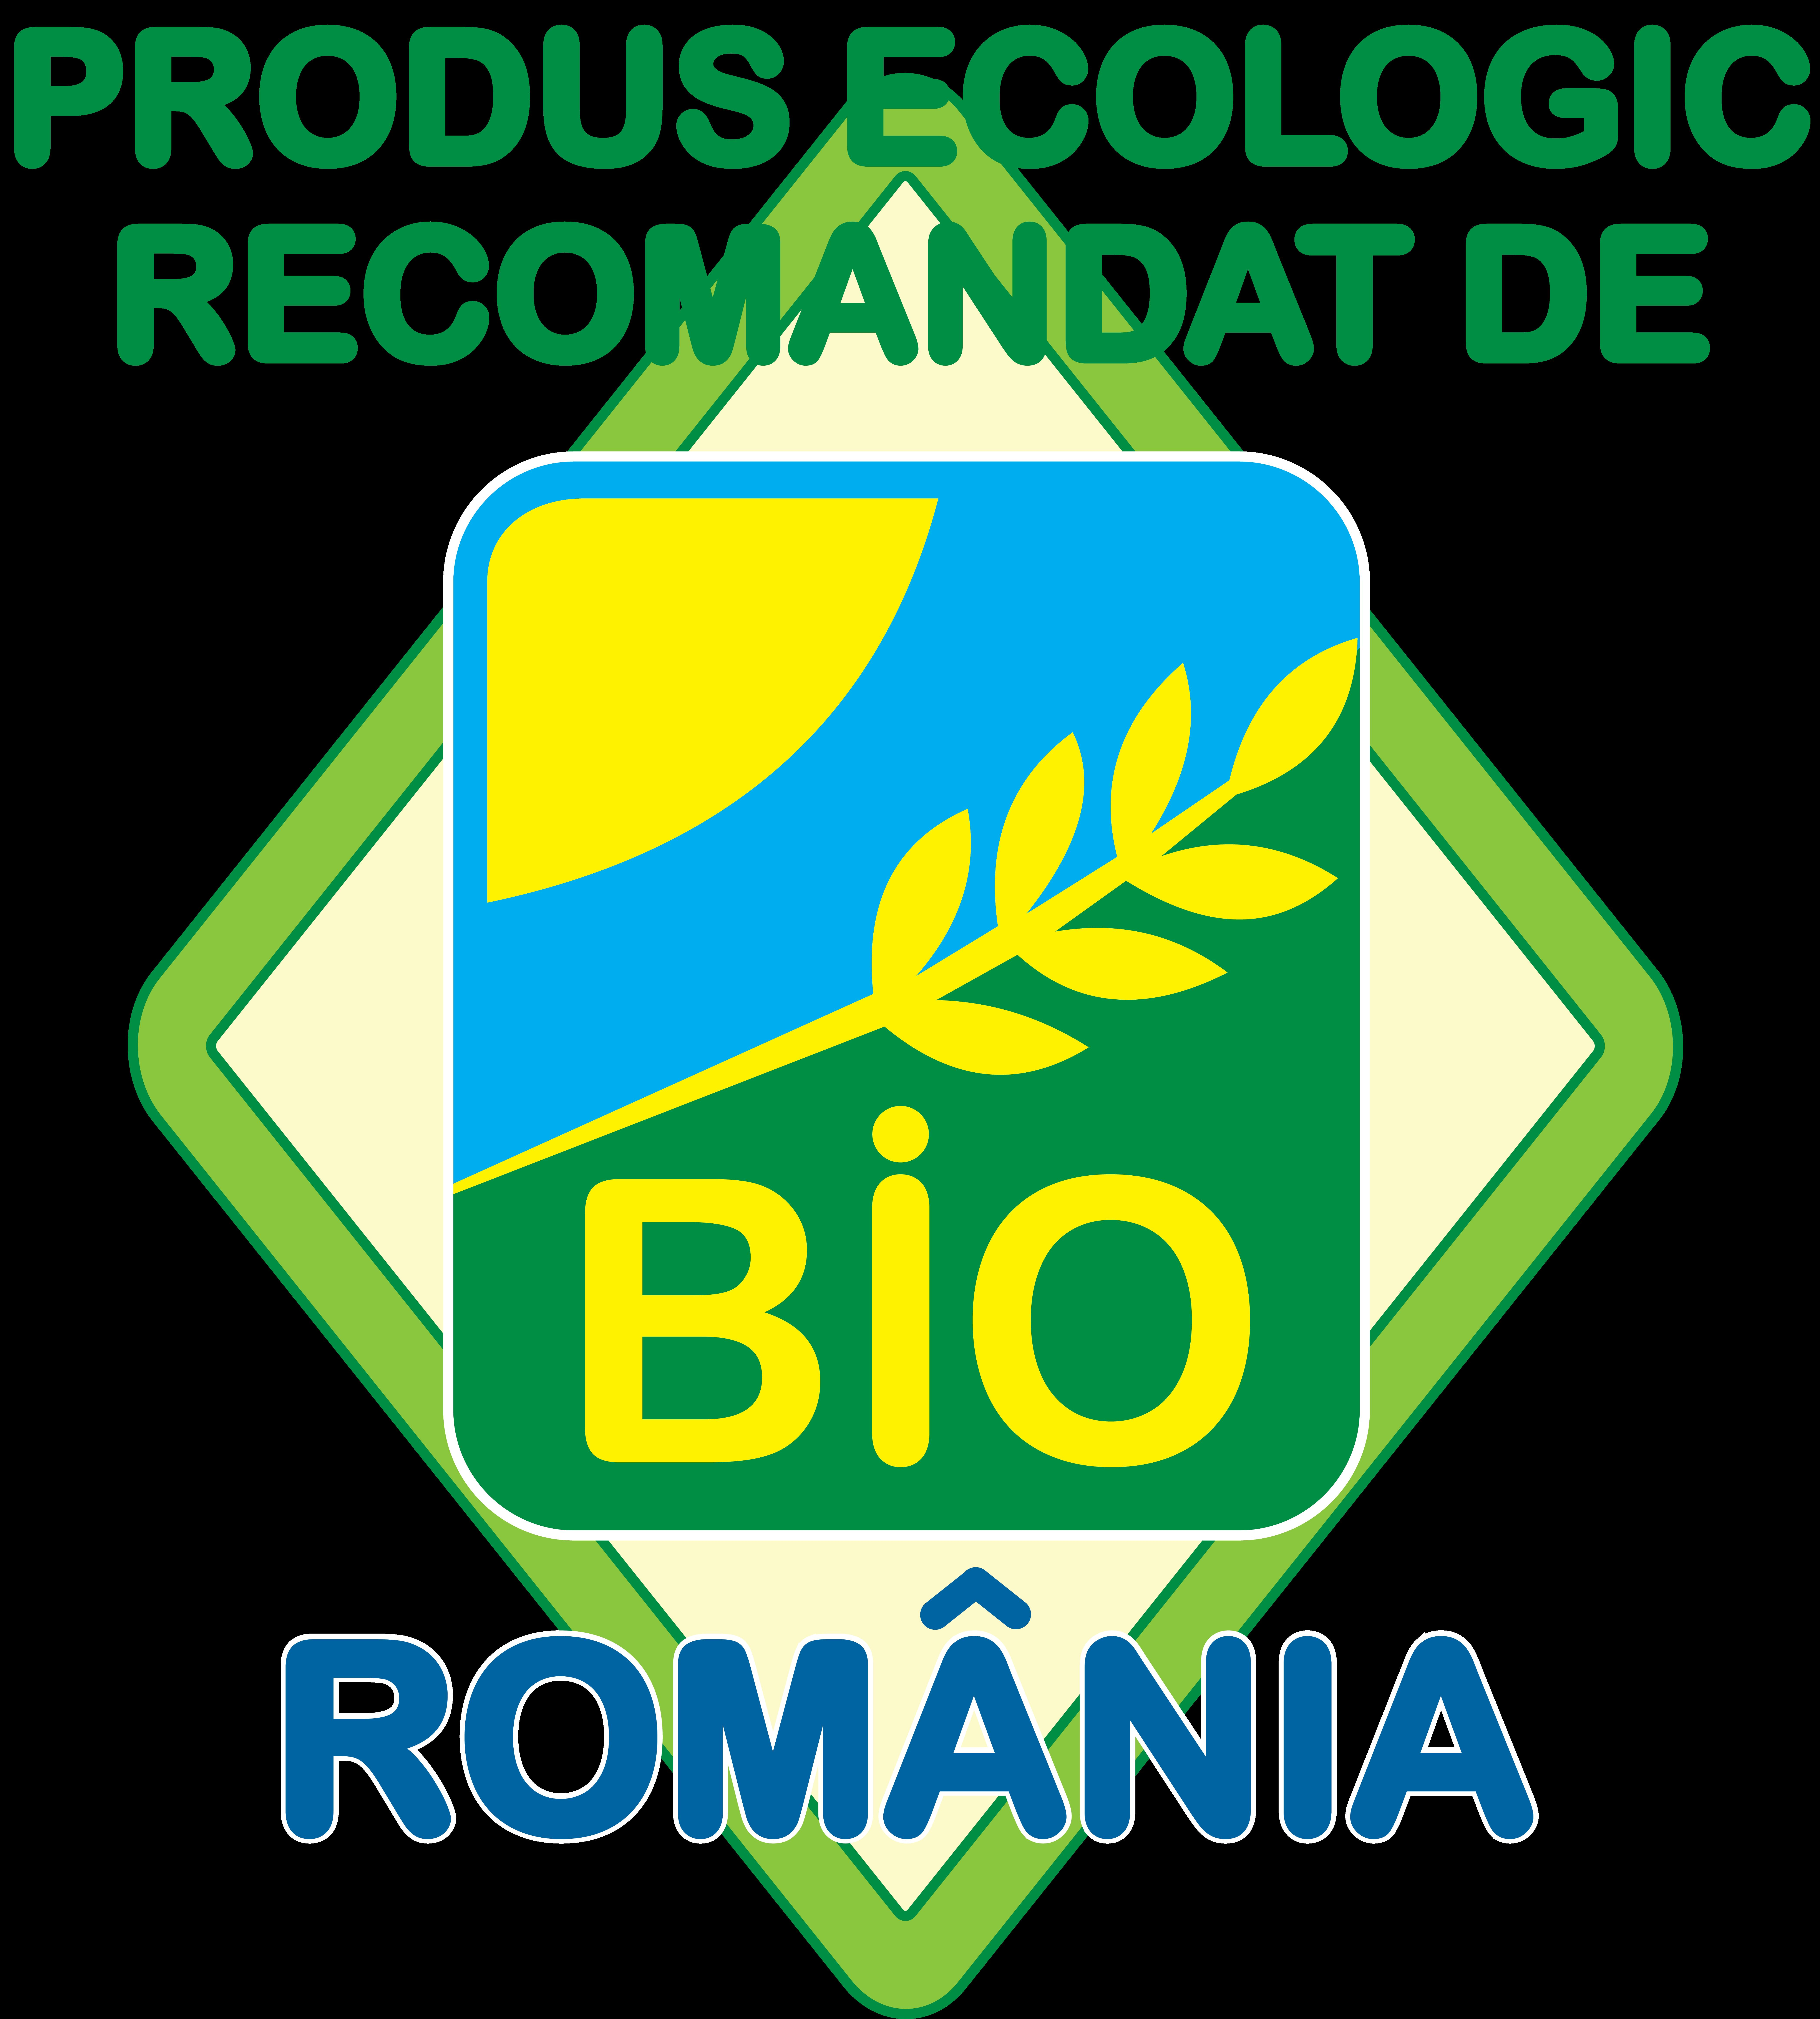 Bio Romania